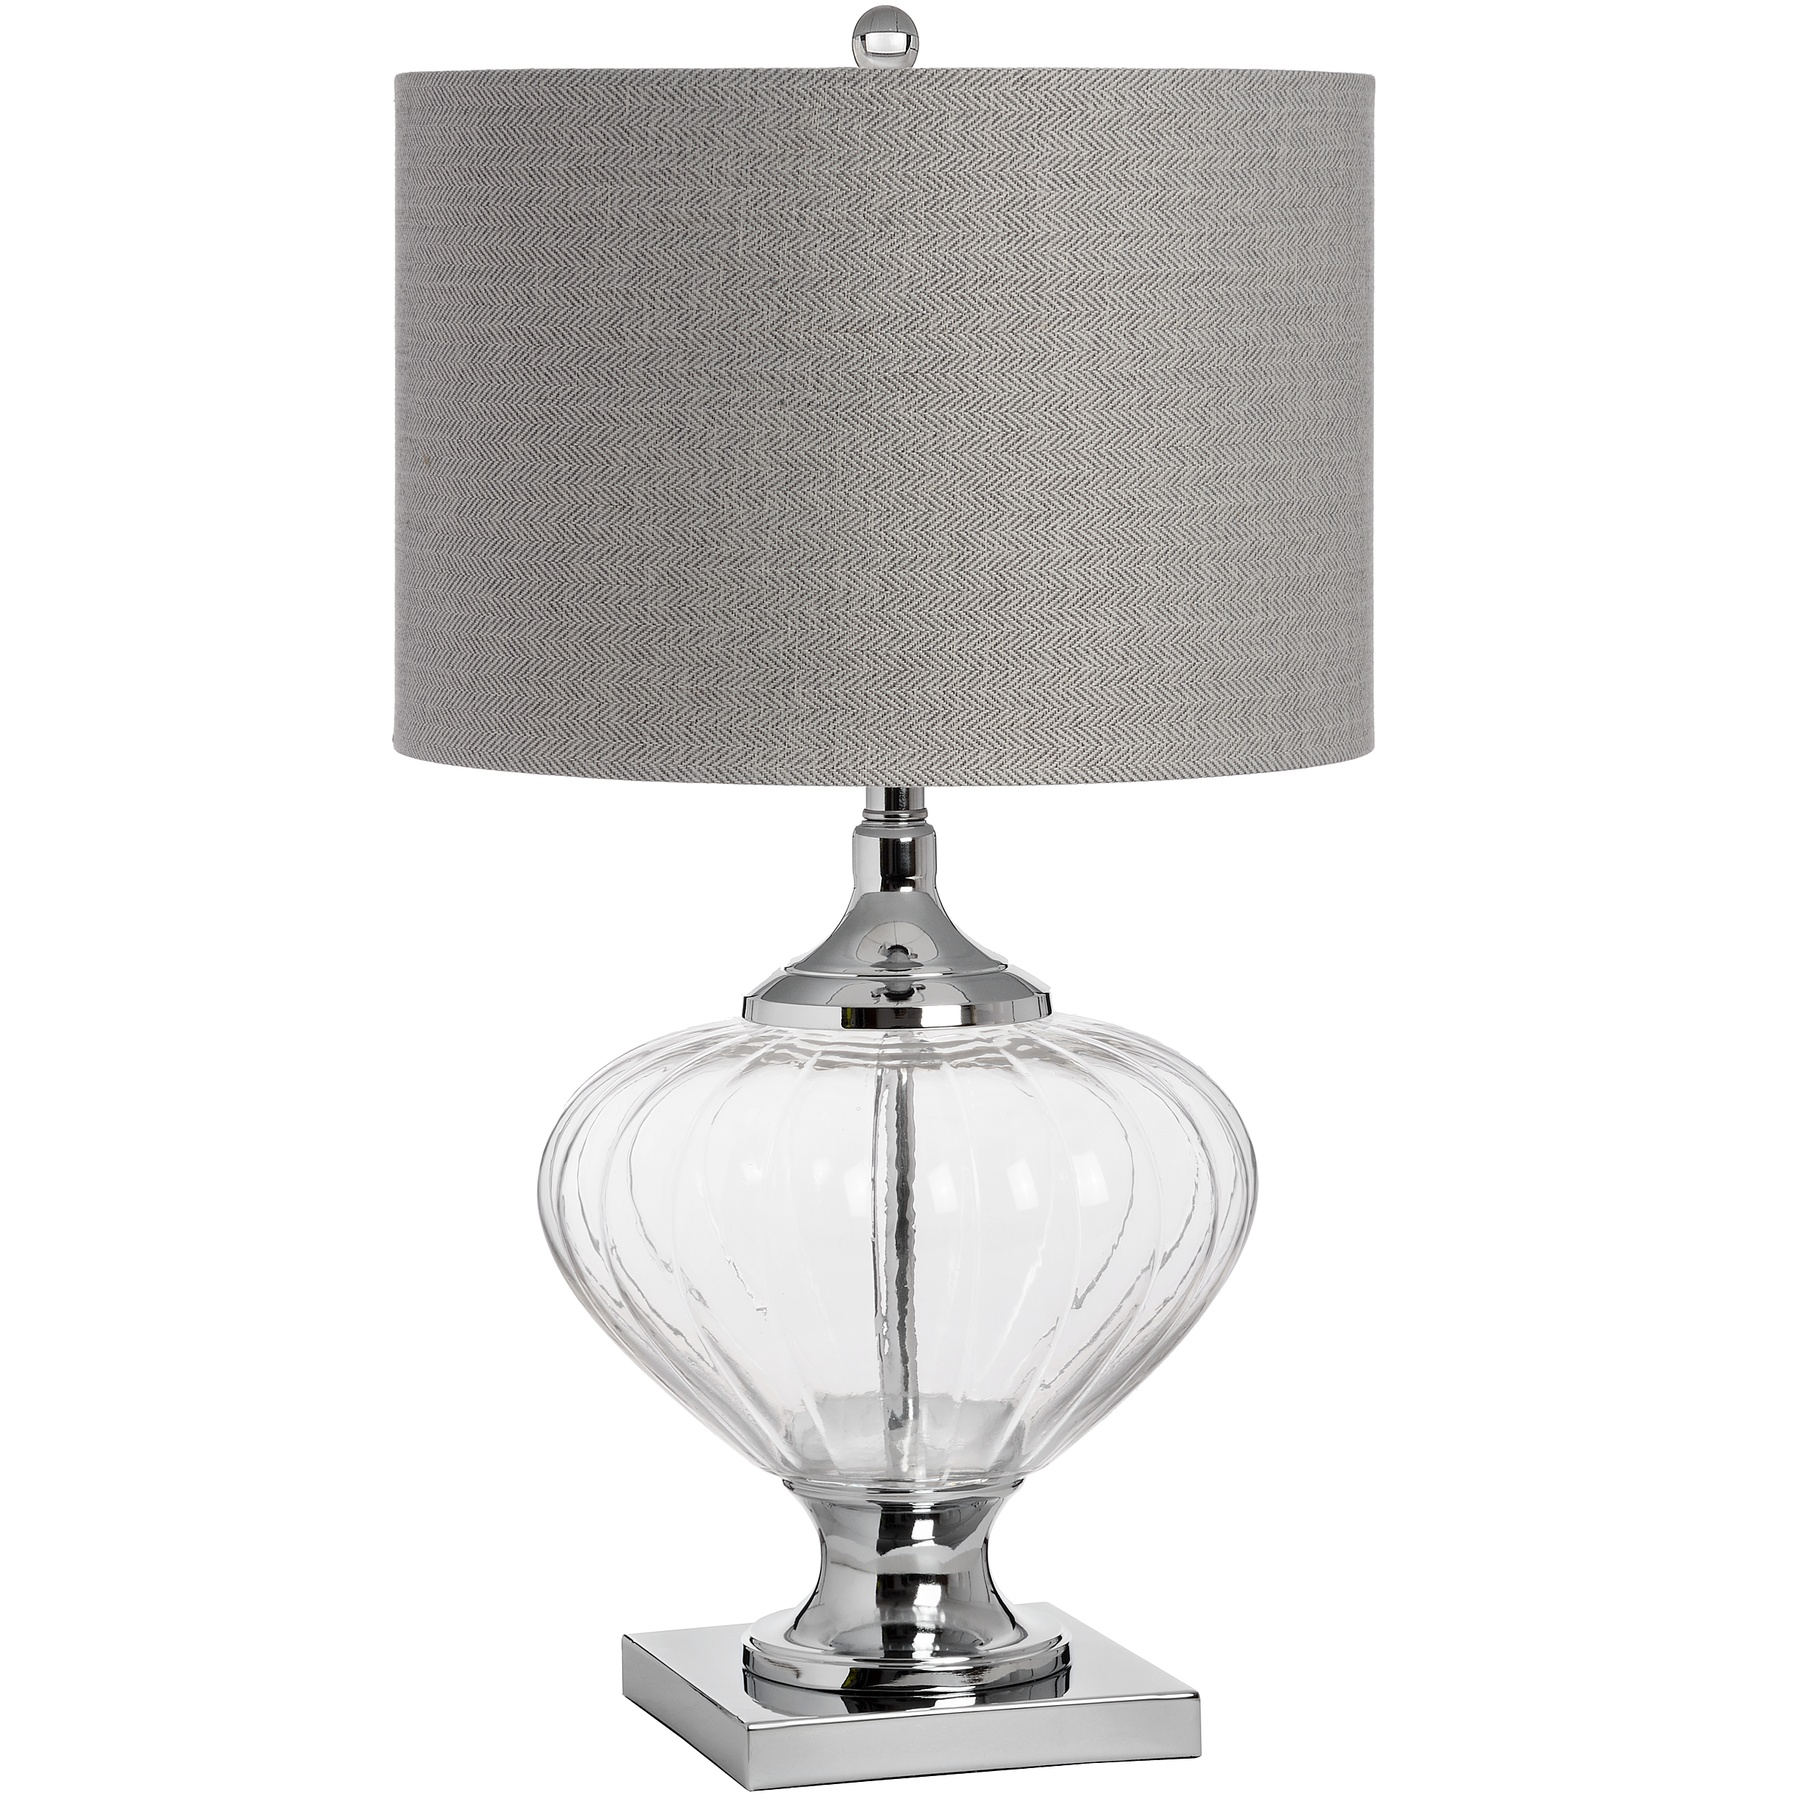 Verona Glass Table Lamp